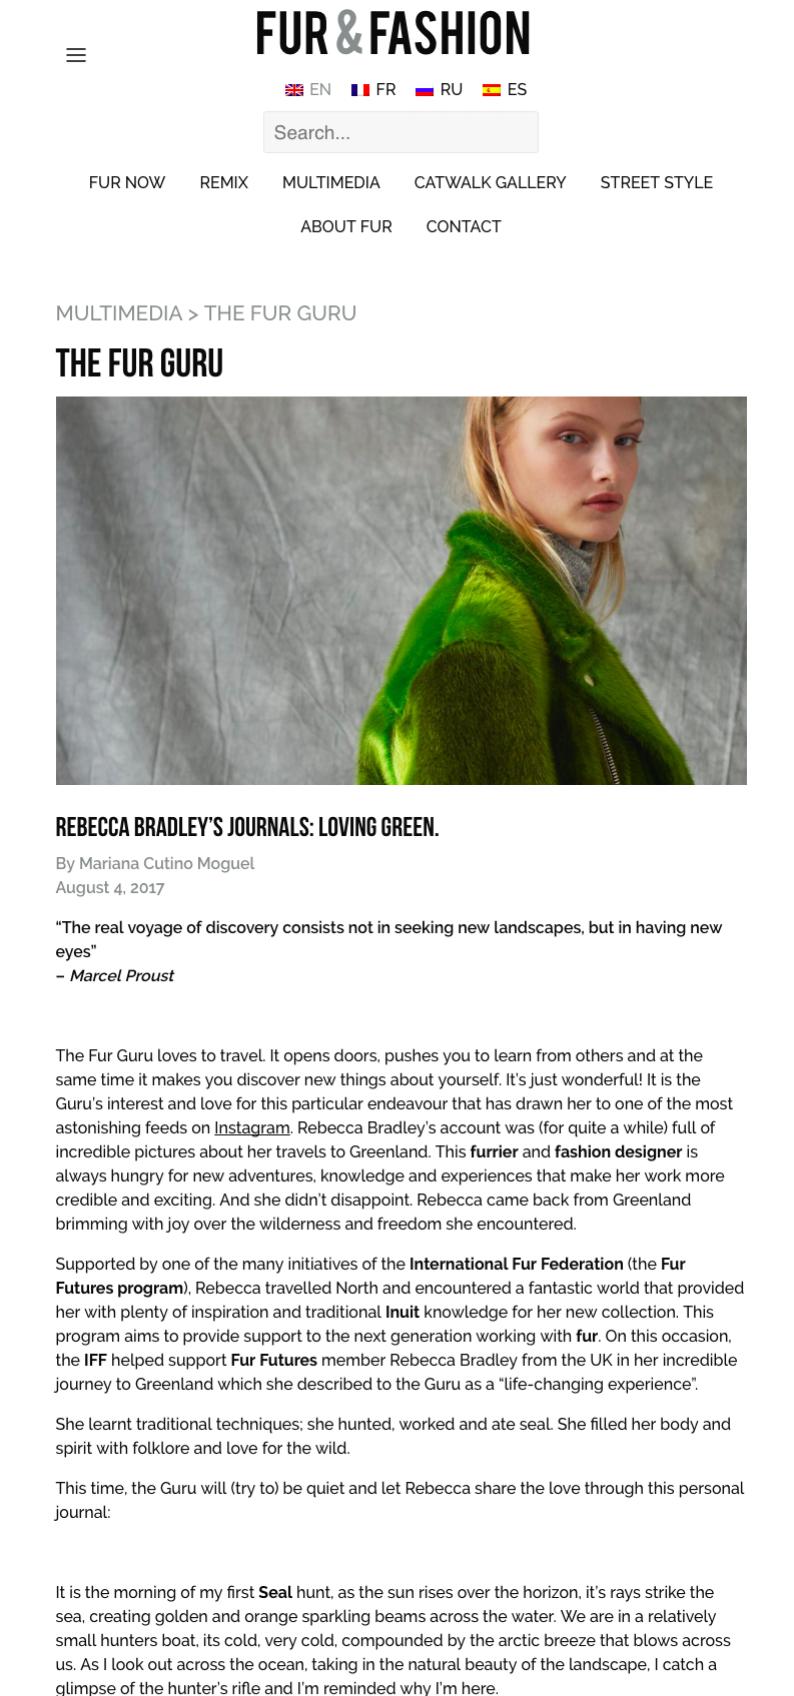 To read the full article: https://www.wearefur.com/rebecca-bradleys-journals/